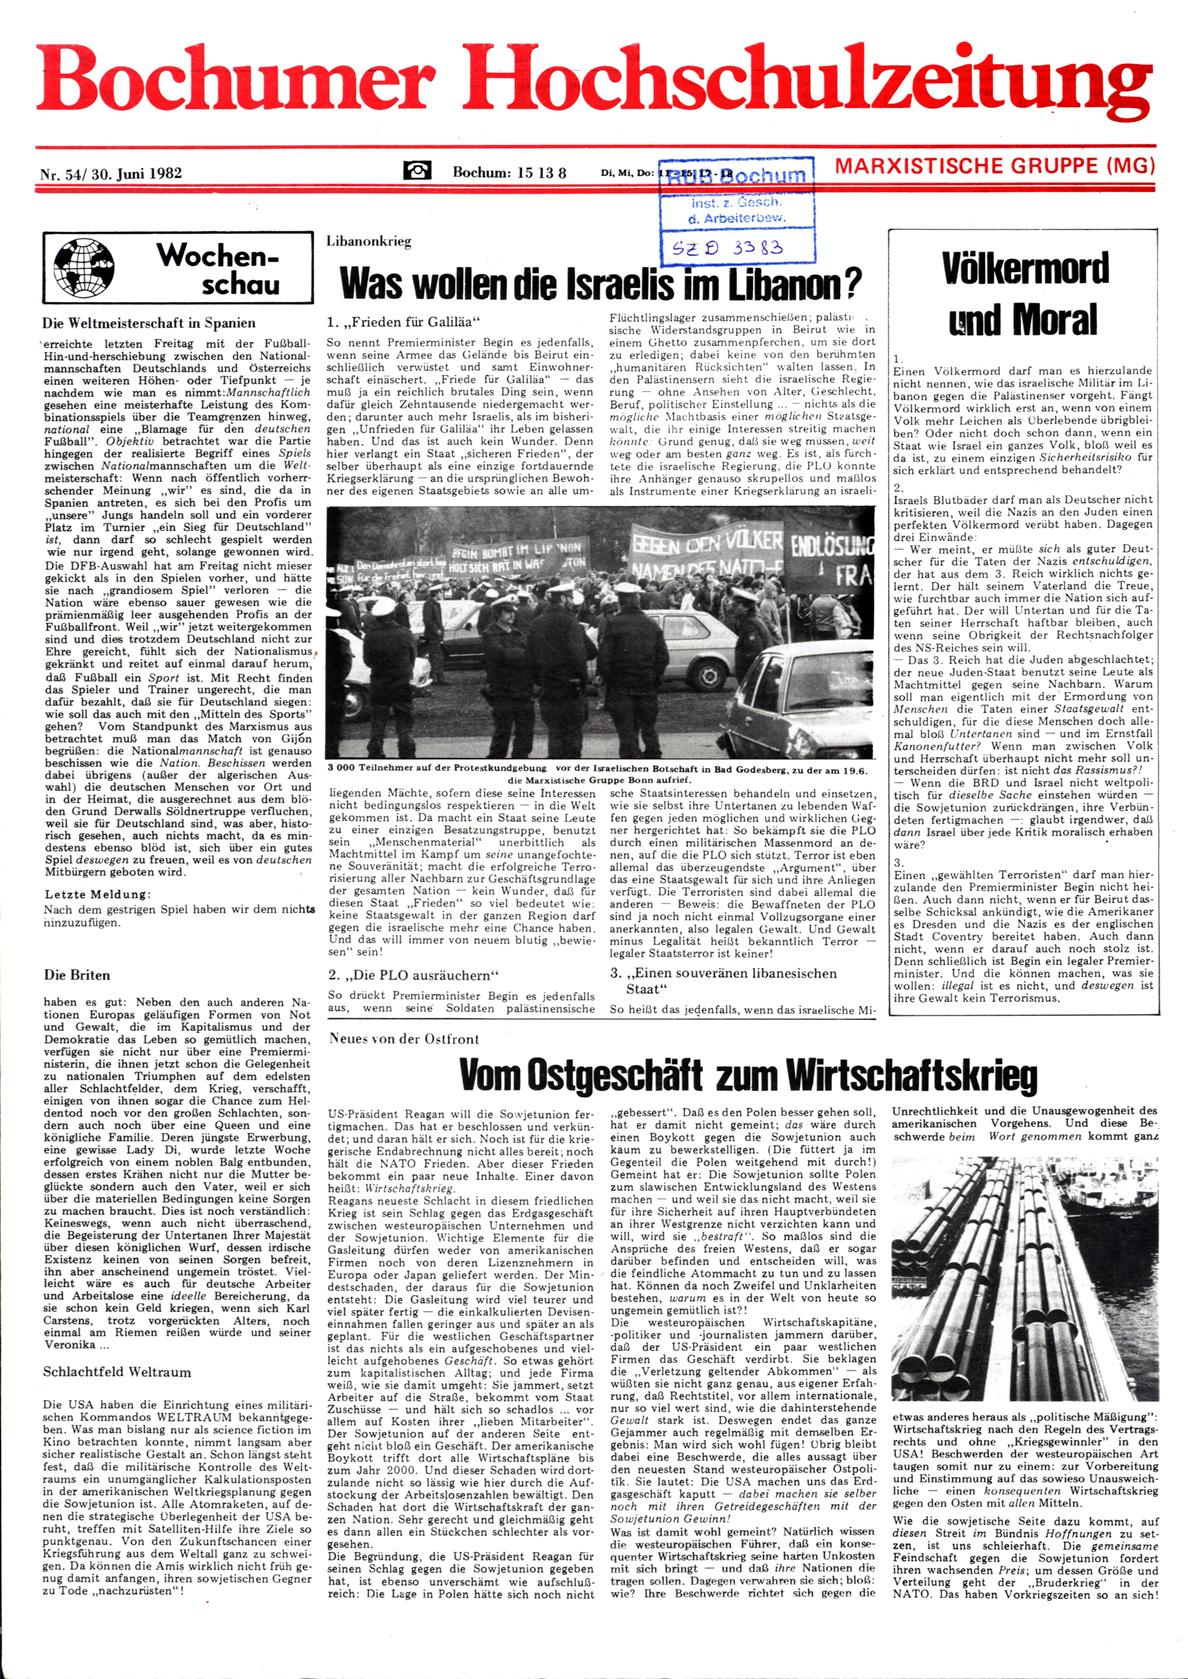 Bochum_BHZ_19820630_054_001